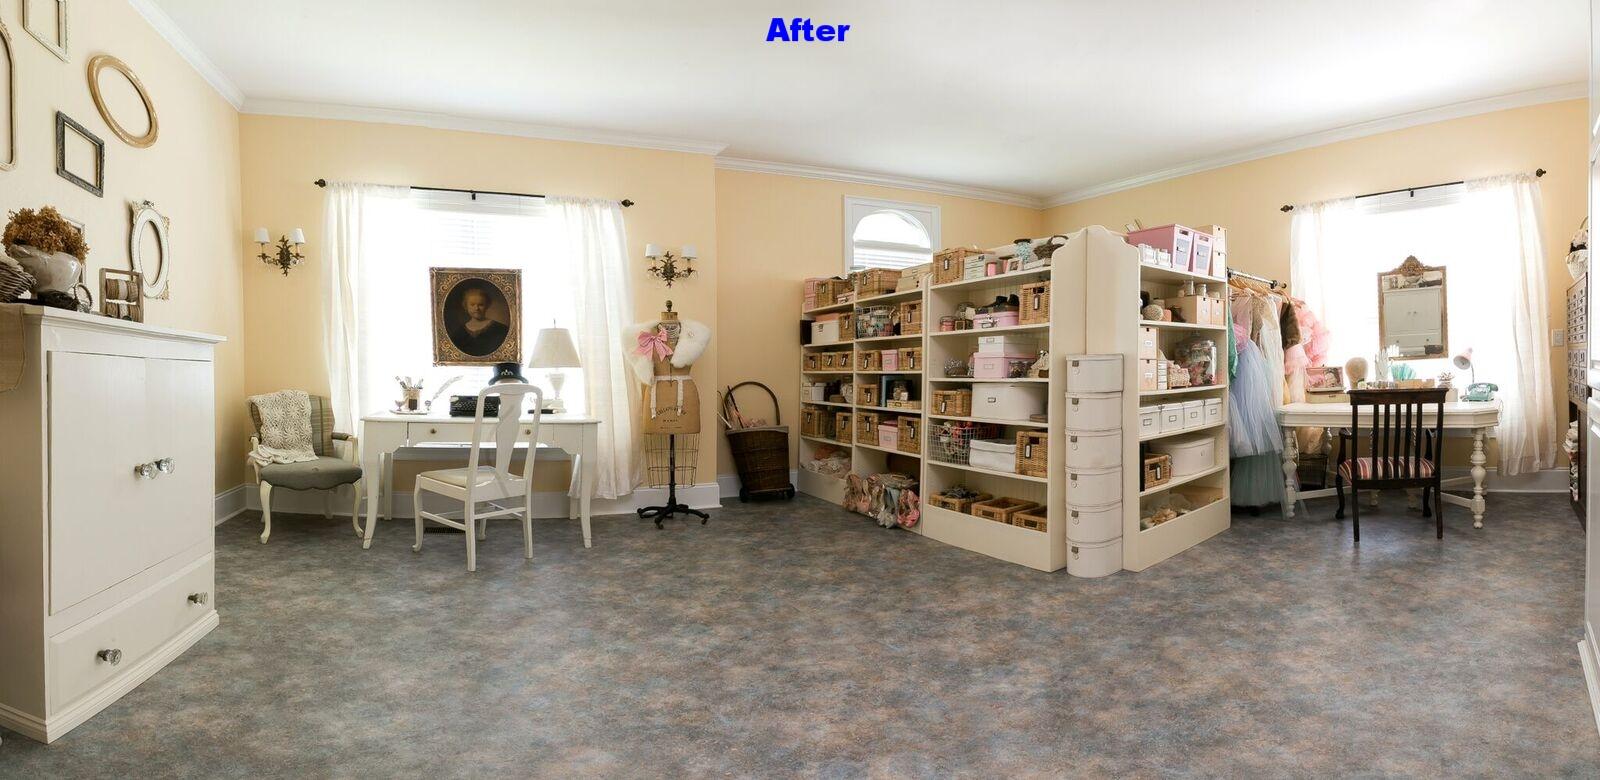 Large vintage craft room